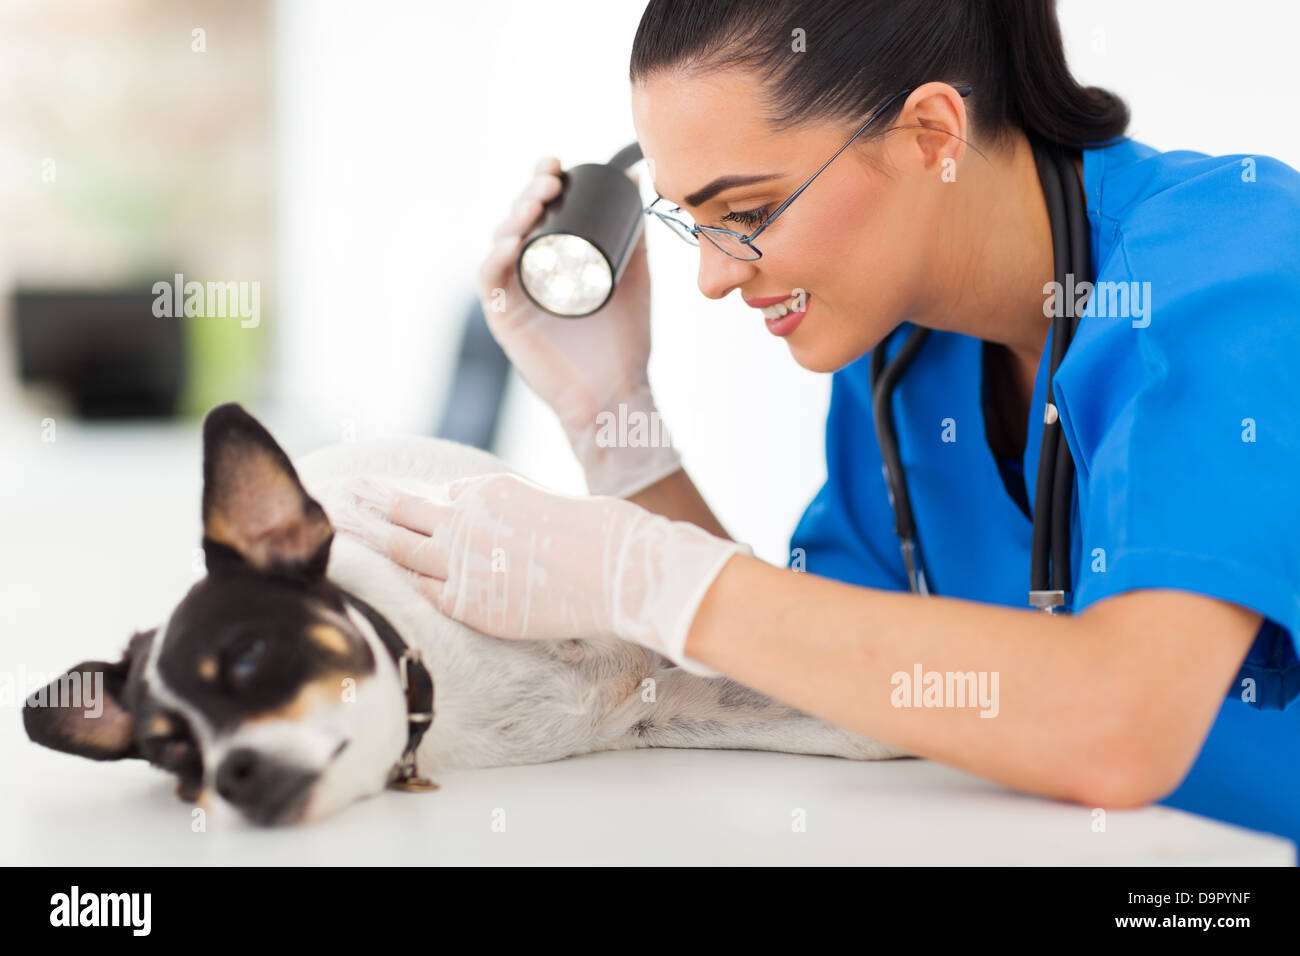 professional vet doctor examining pet dog skin with examining light - Stock Image